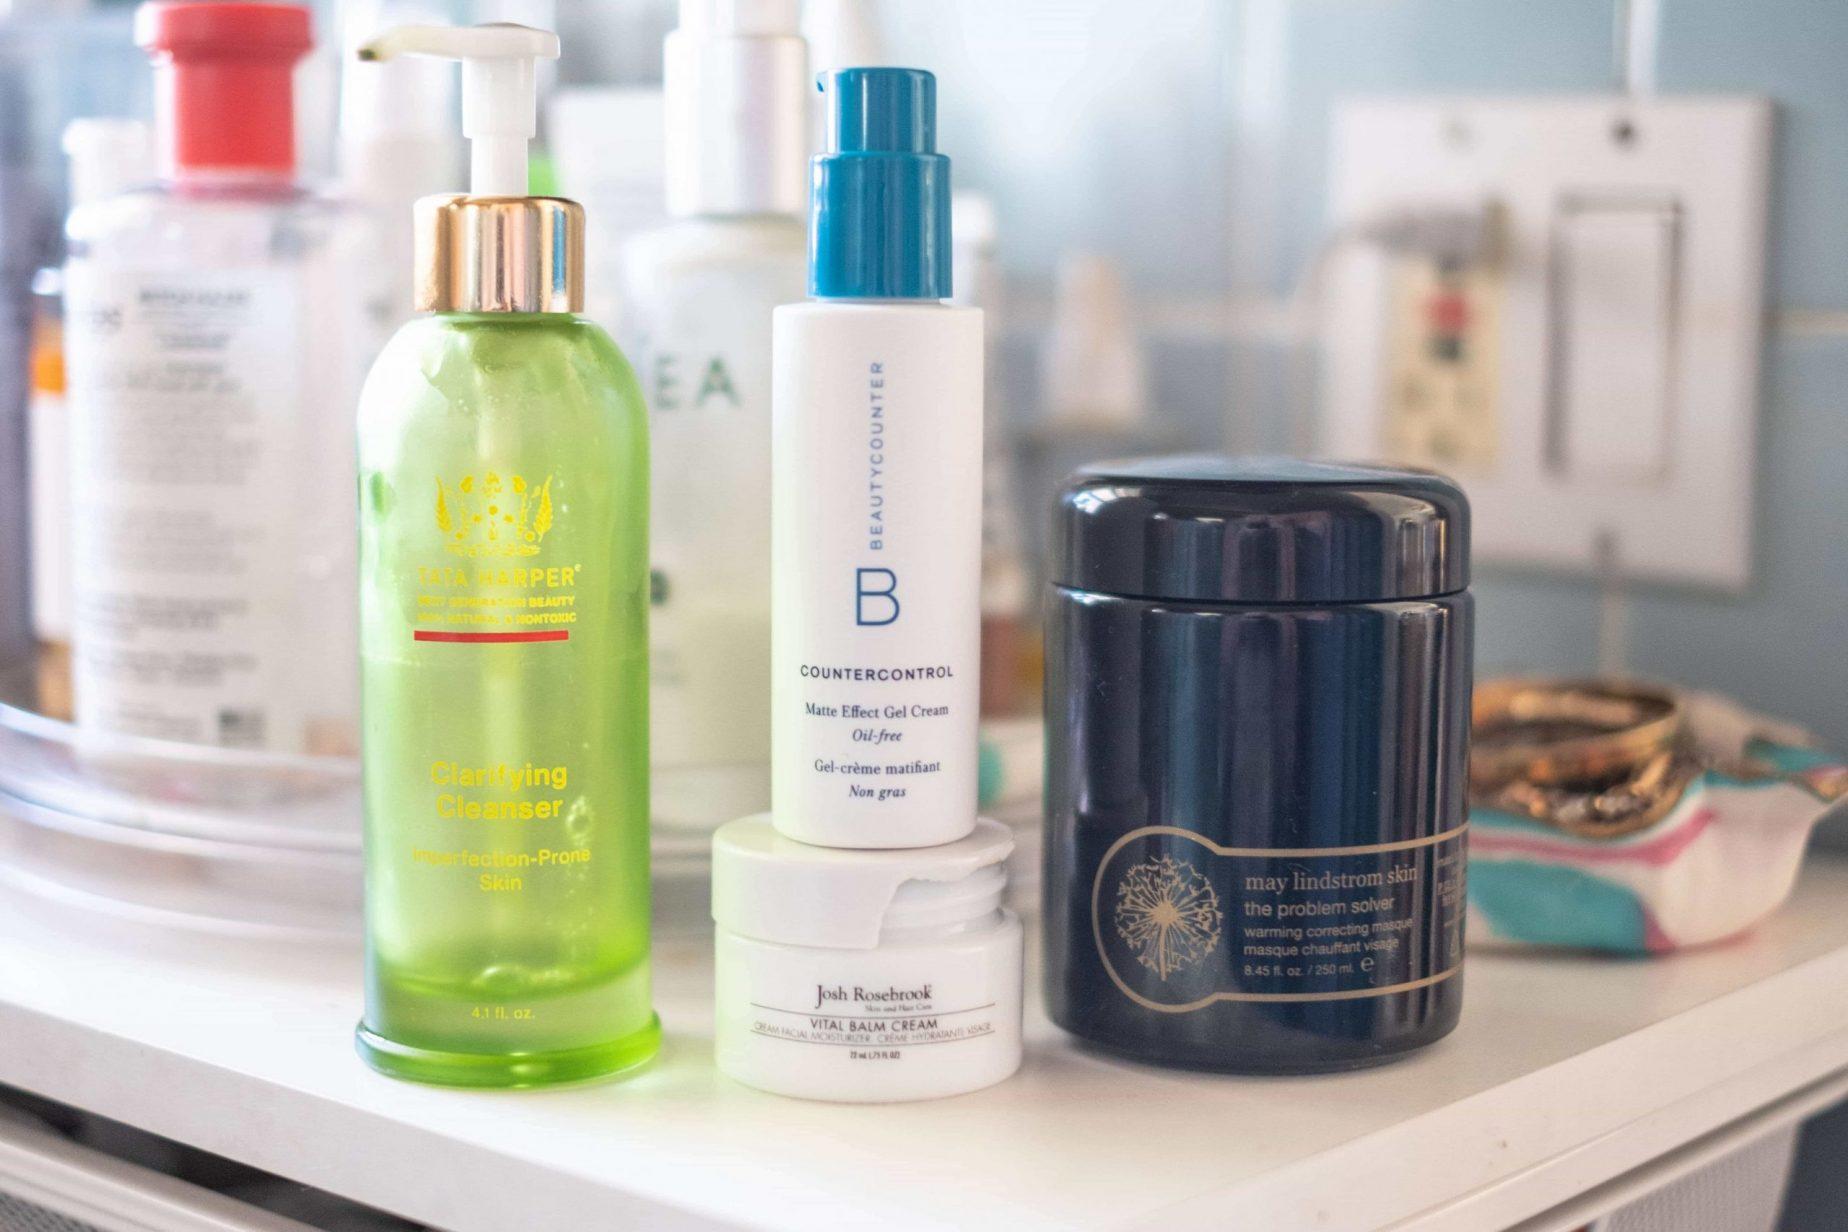 5 Products That Helped With My Acne Prone Skin #whatsavvysaid #acneproneskin #facemask #acne #wellnessblogger #joshrosebrook #tatahaper #maylindstrom #beautycounter #nontoxicskincare